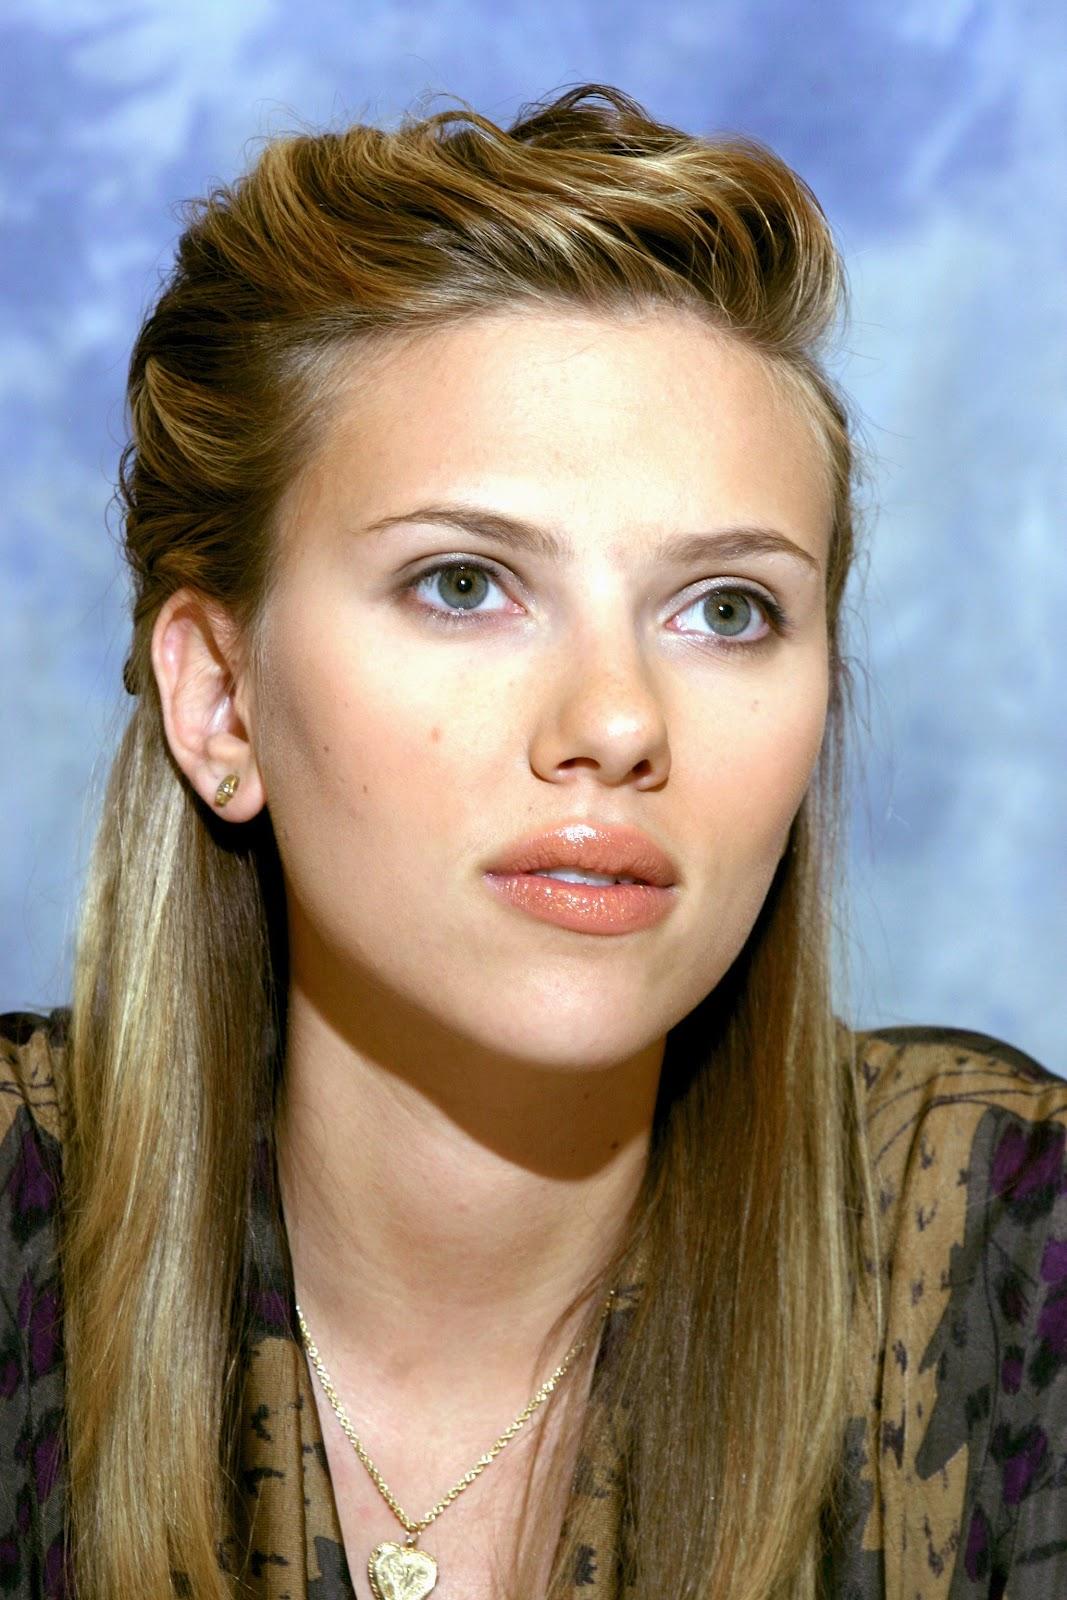 Scarlett johansson pictures gallery 25 film actresses - Scarlett johansson blogspot ...